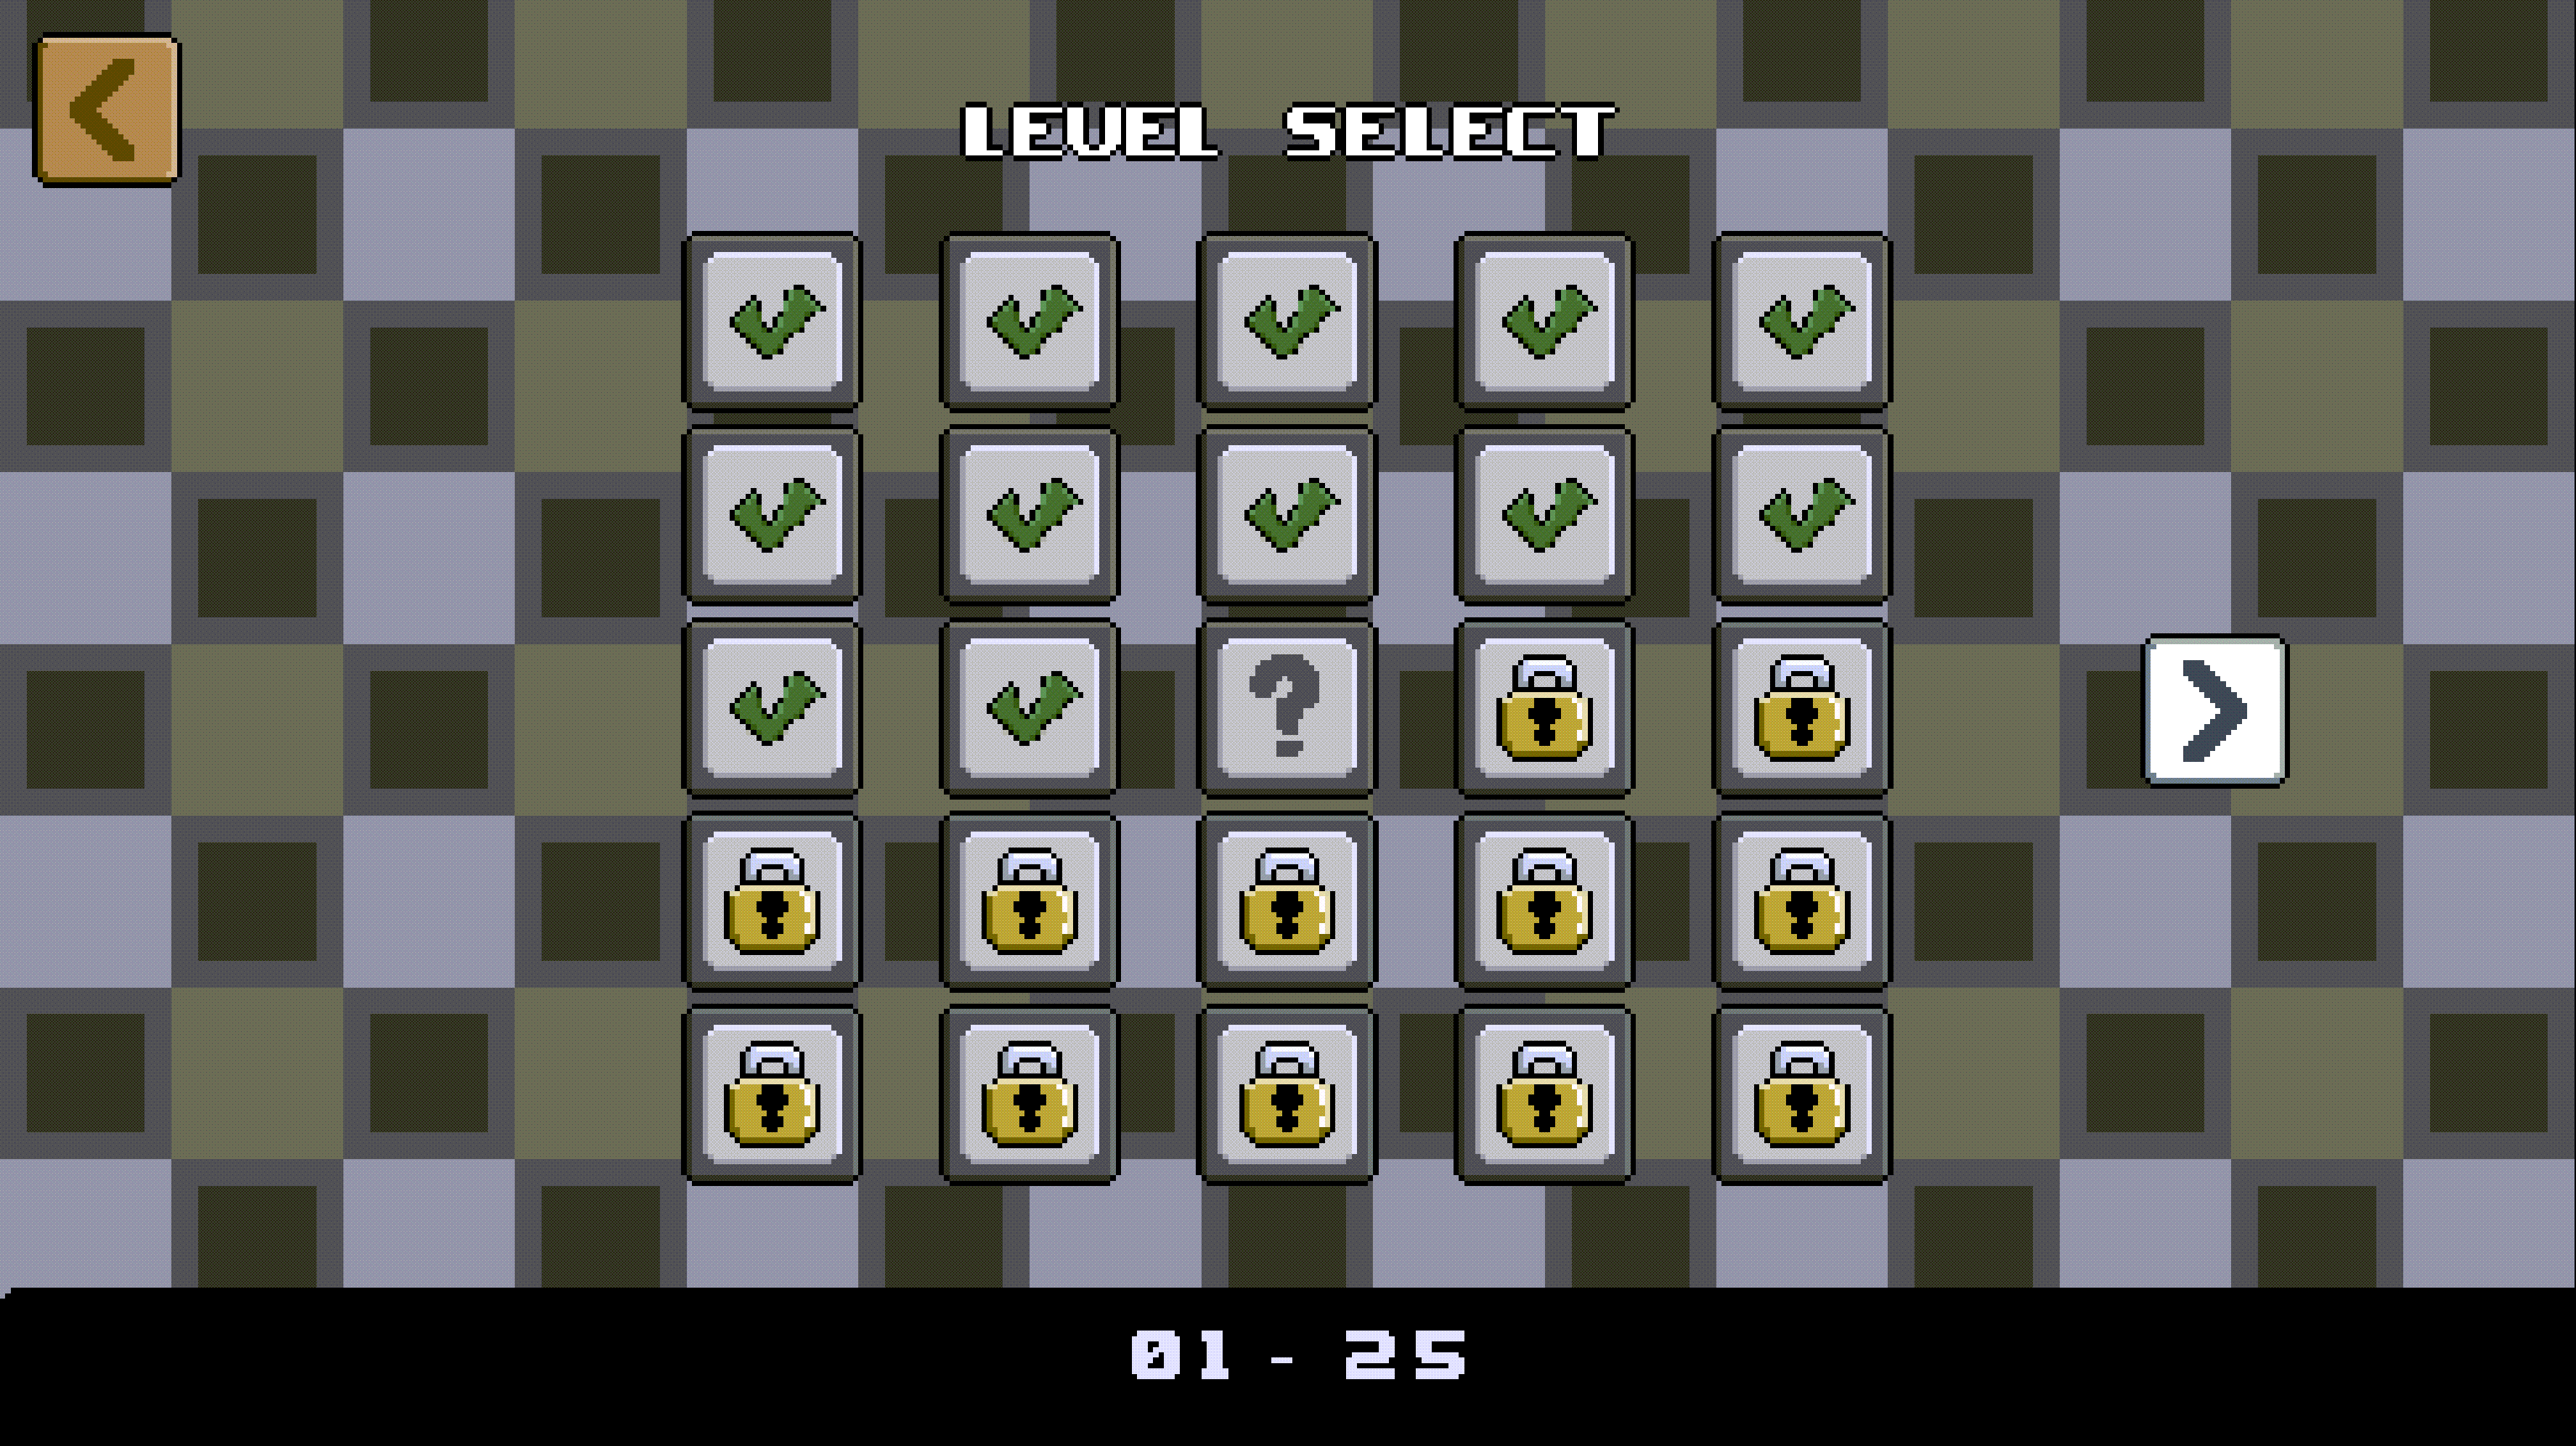 Shadoworld Adventure Level Select Screenshot.